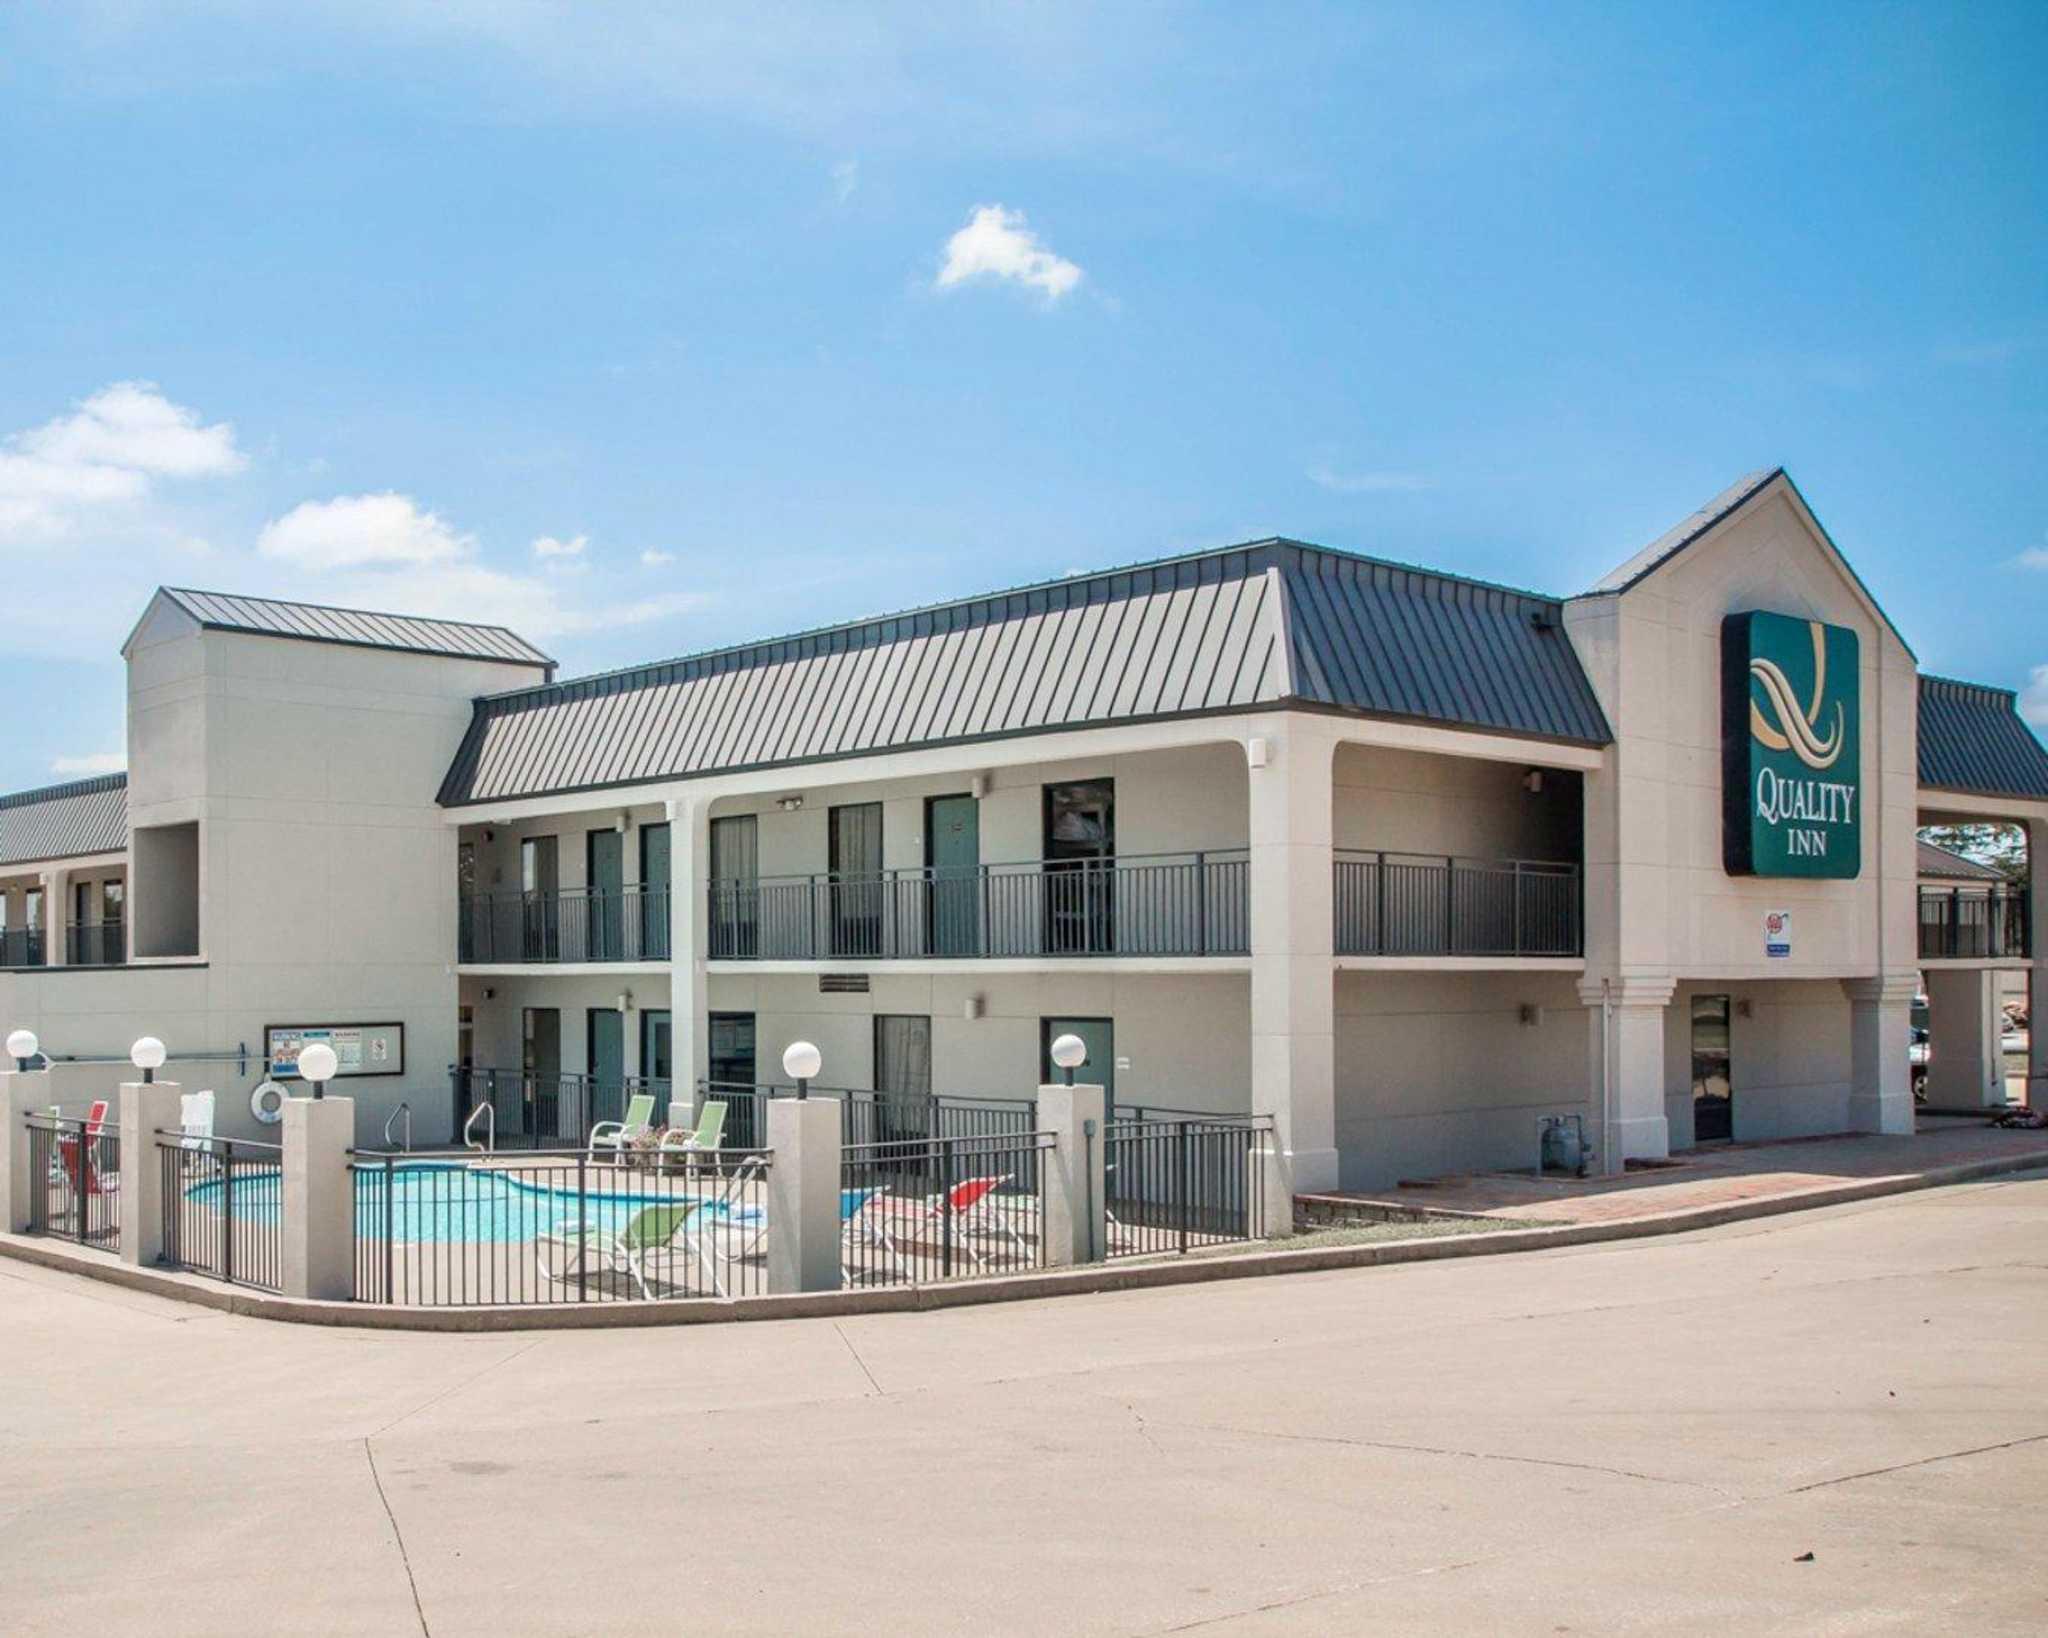 Quality Inn US65 & E Battlefield Rd Springfield